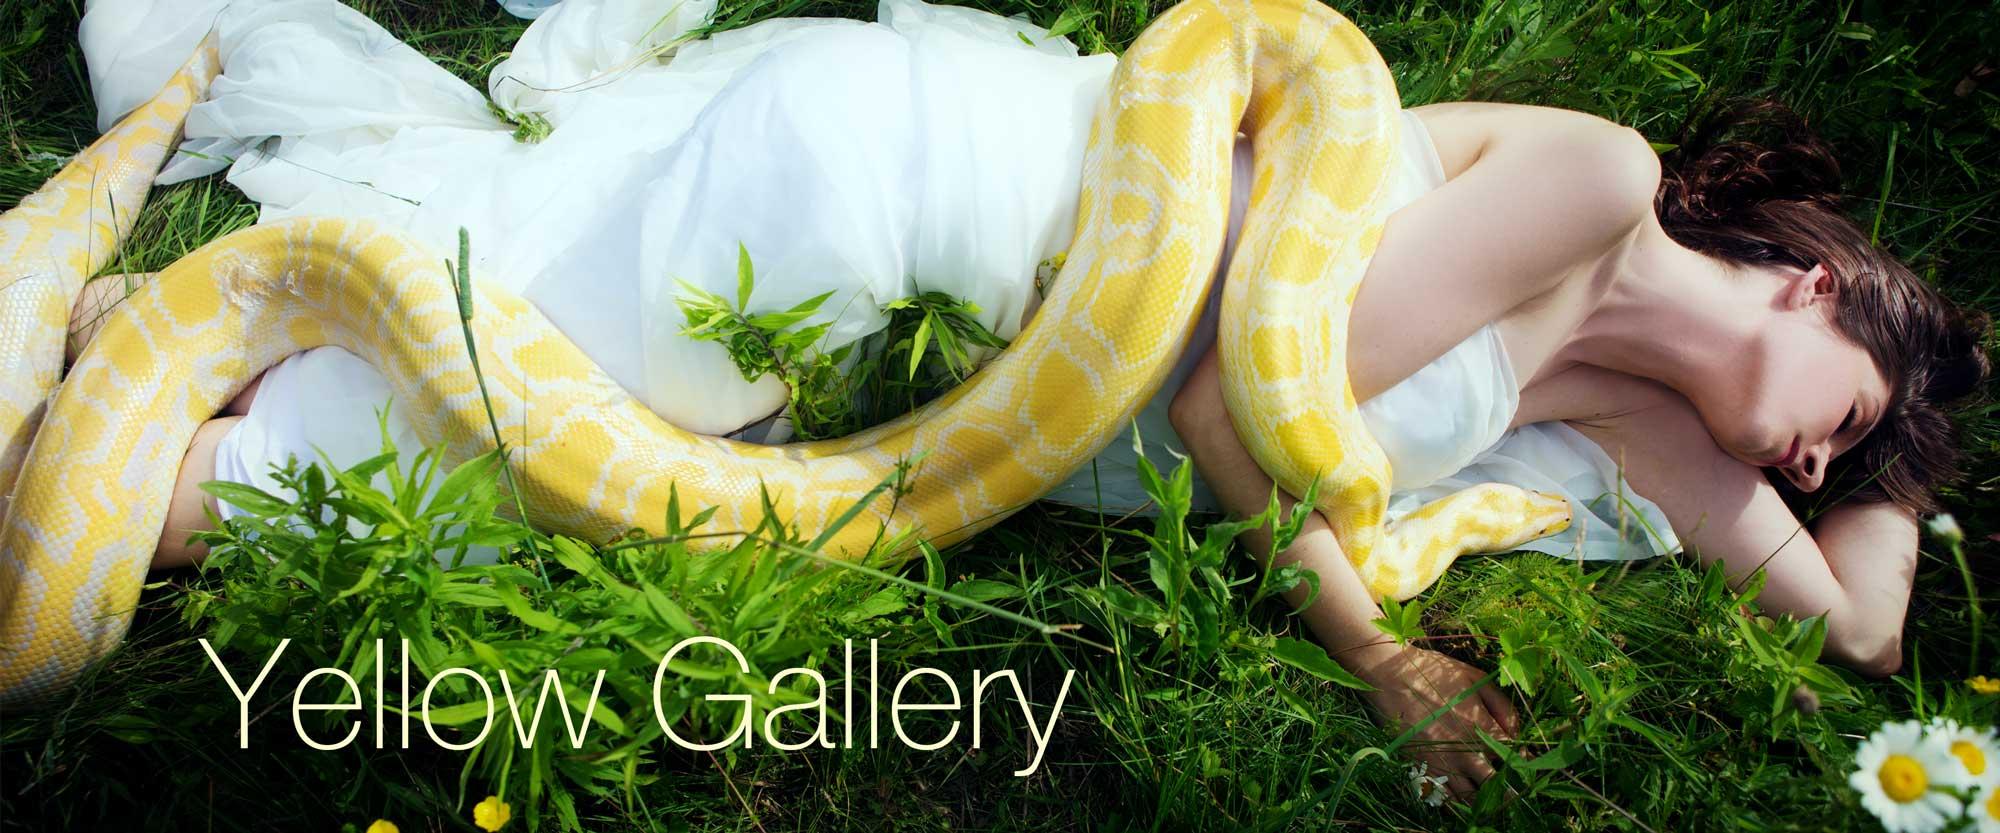 Laüra Hollick Yellow Gallery